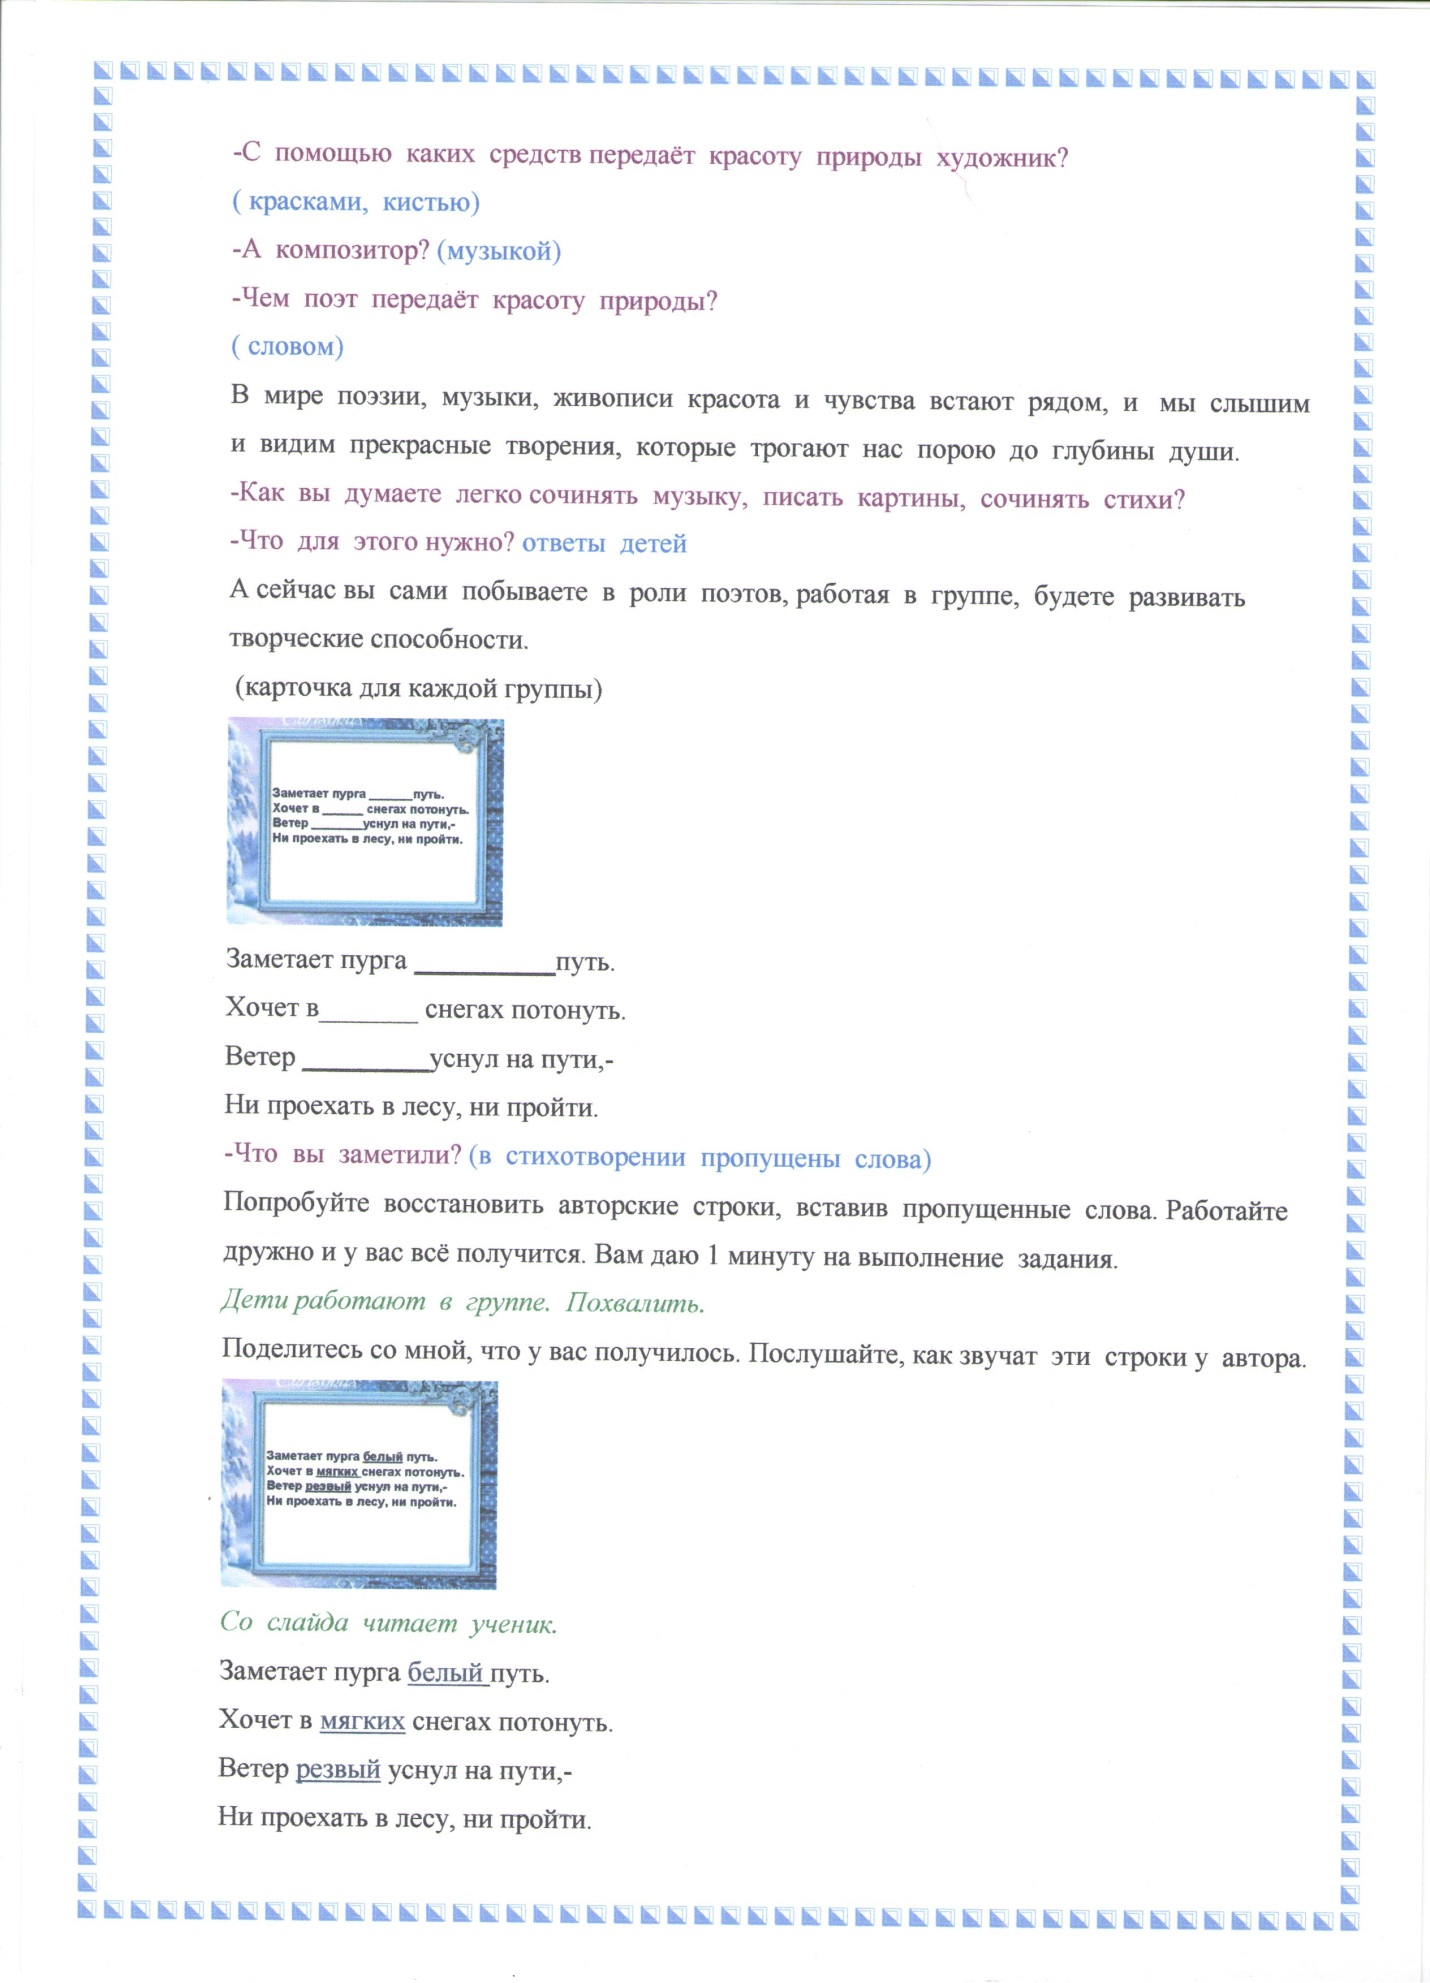 C:\Users\User\Desktop\3Б\2015-10-16 4\4 001.jpg